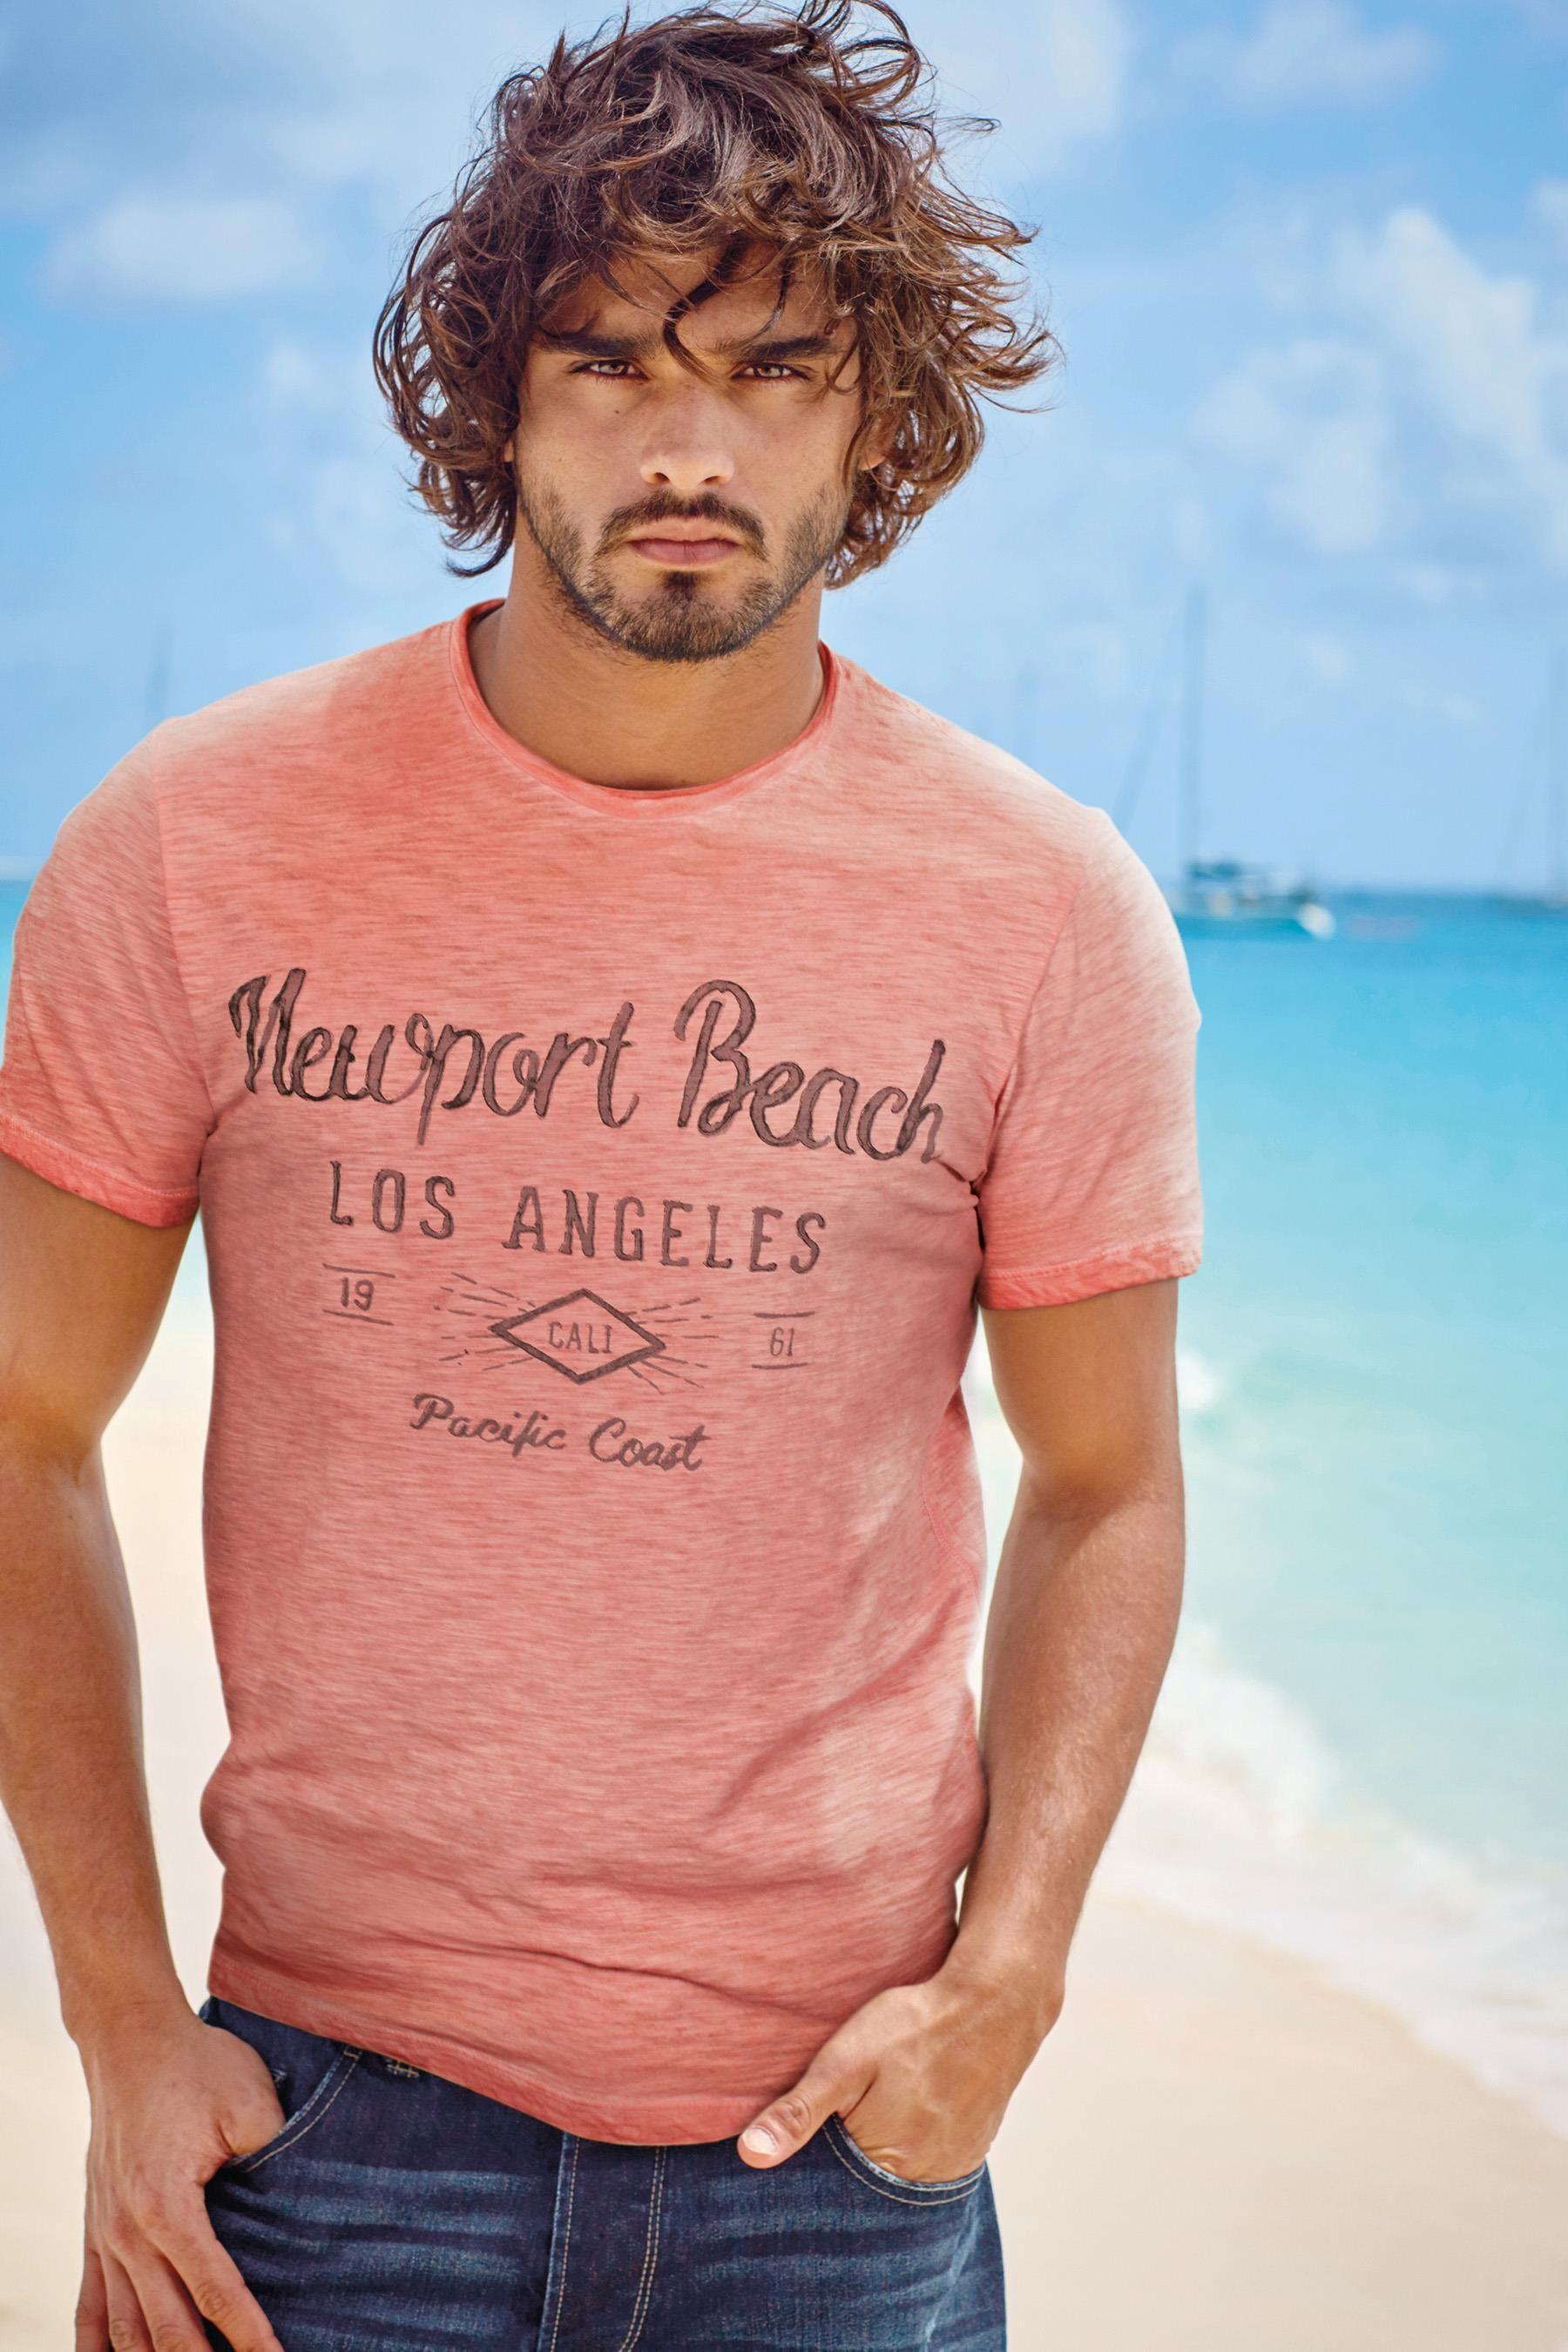 Marlon-Teixeira-Next-Summer-2015-Mens-Beach-Style-Shoot-016 6c28e3932f